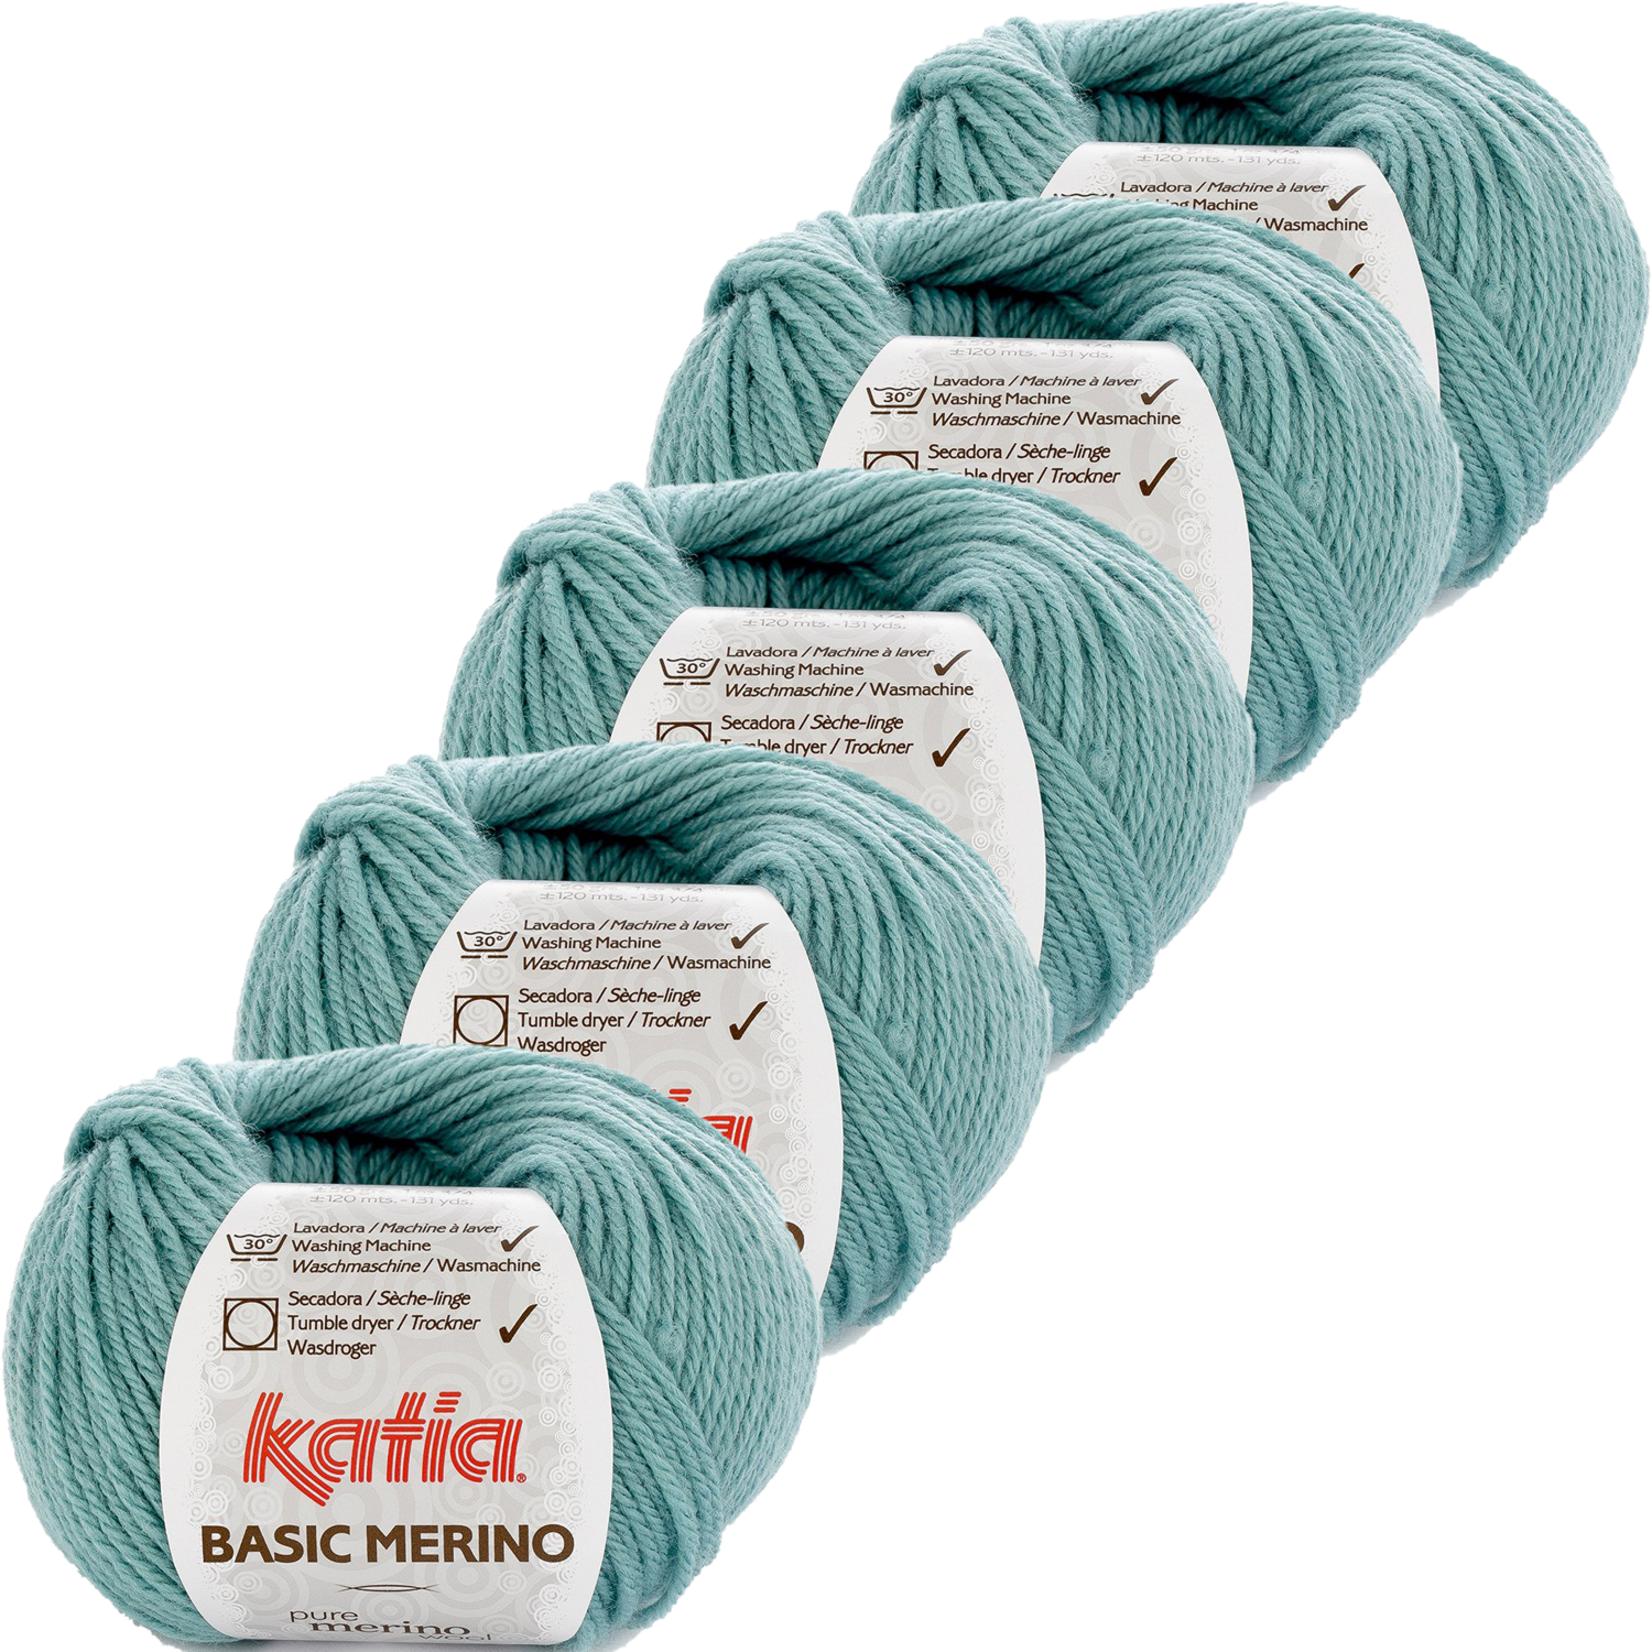 Katia Basic Merino - kleur 73_Waterblauw - bundel 5 bollen 50 gr.  van 120 m.